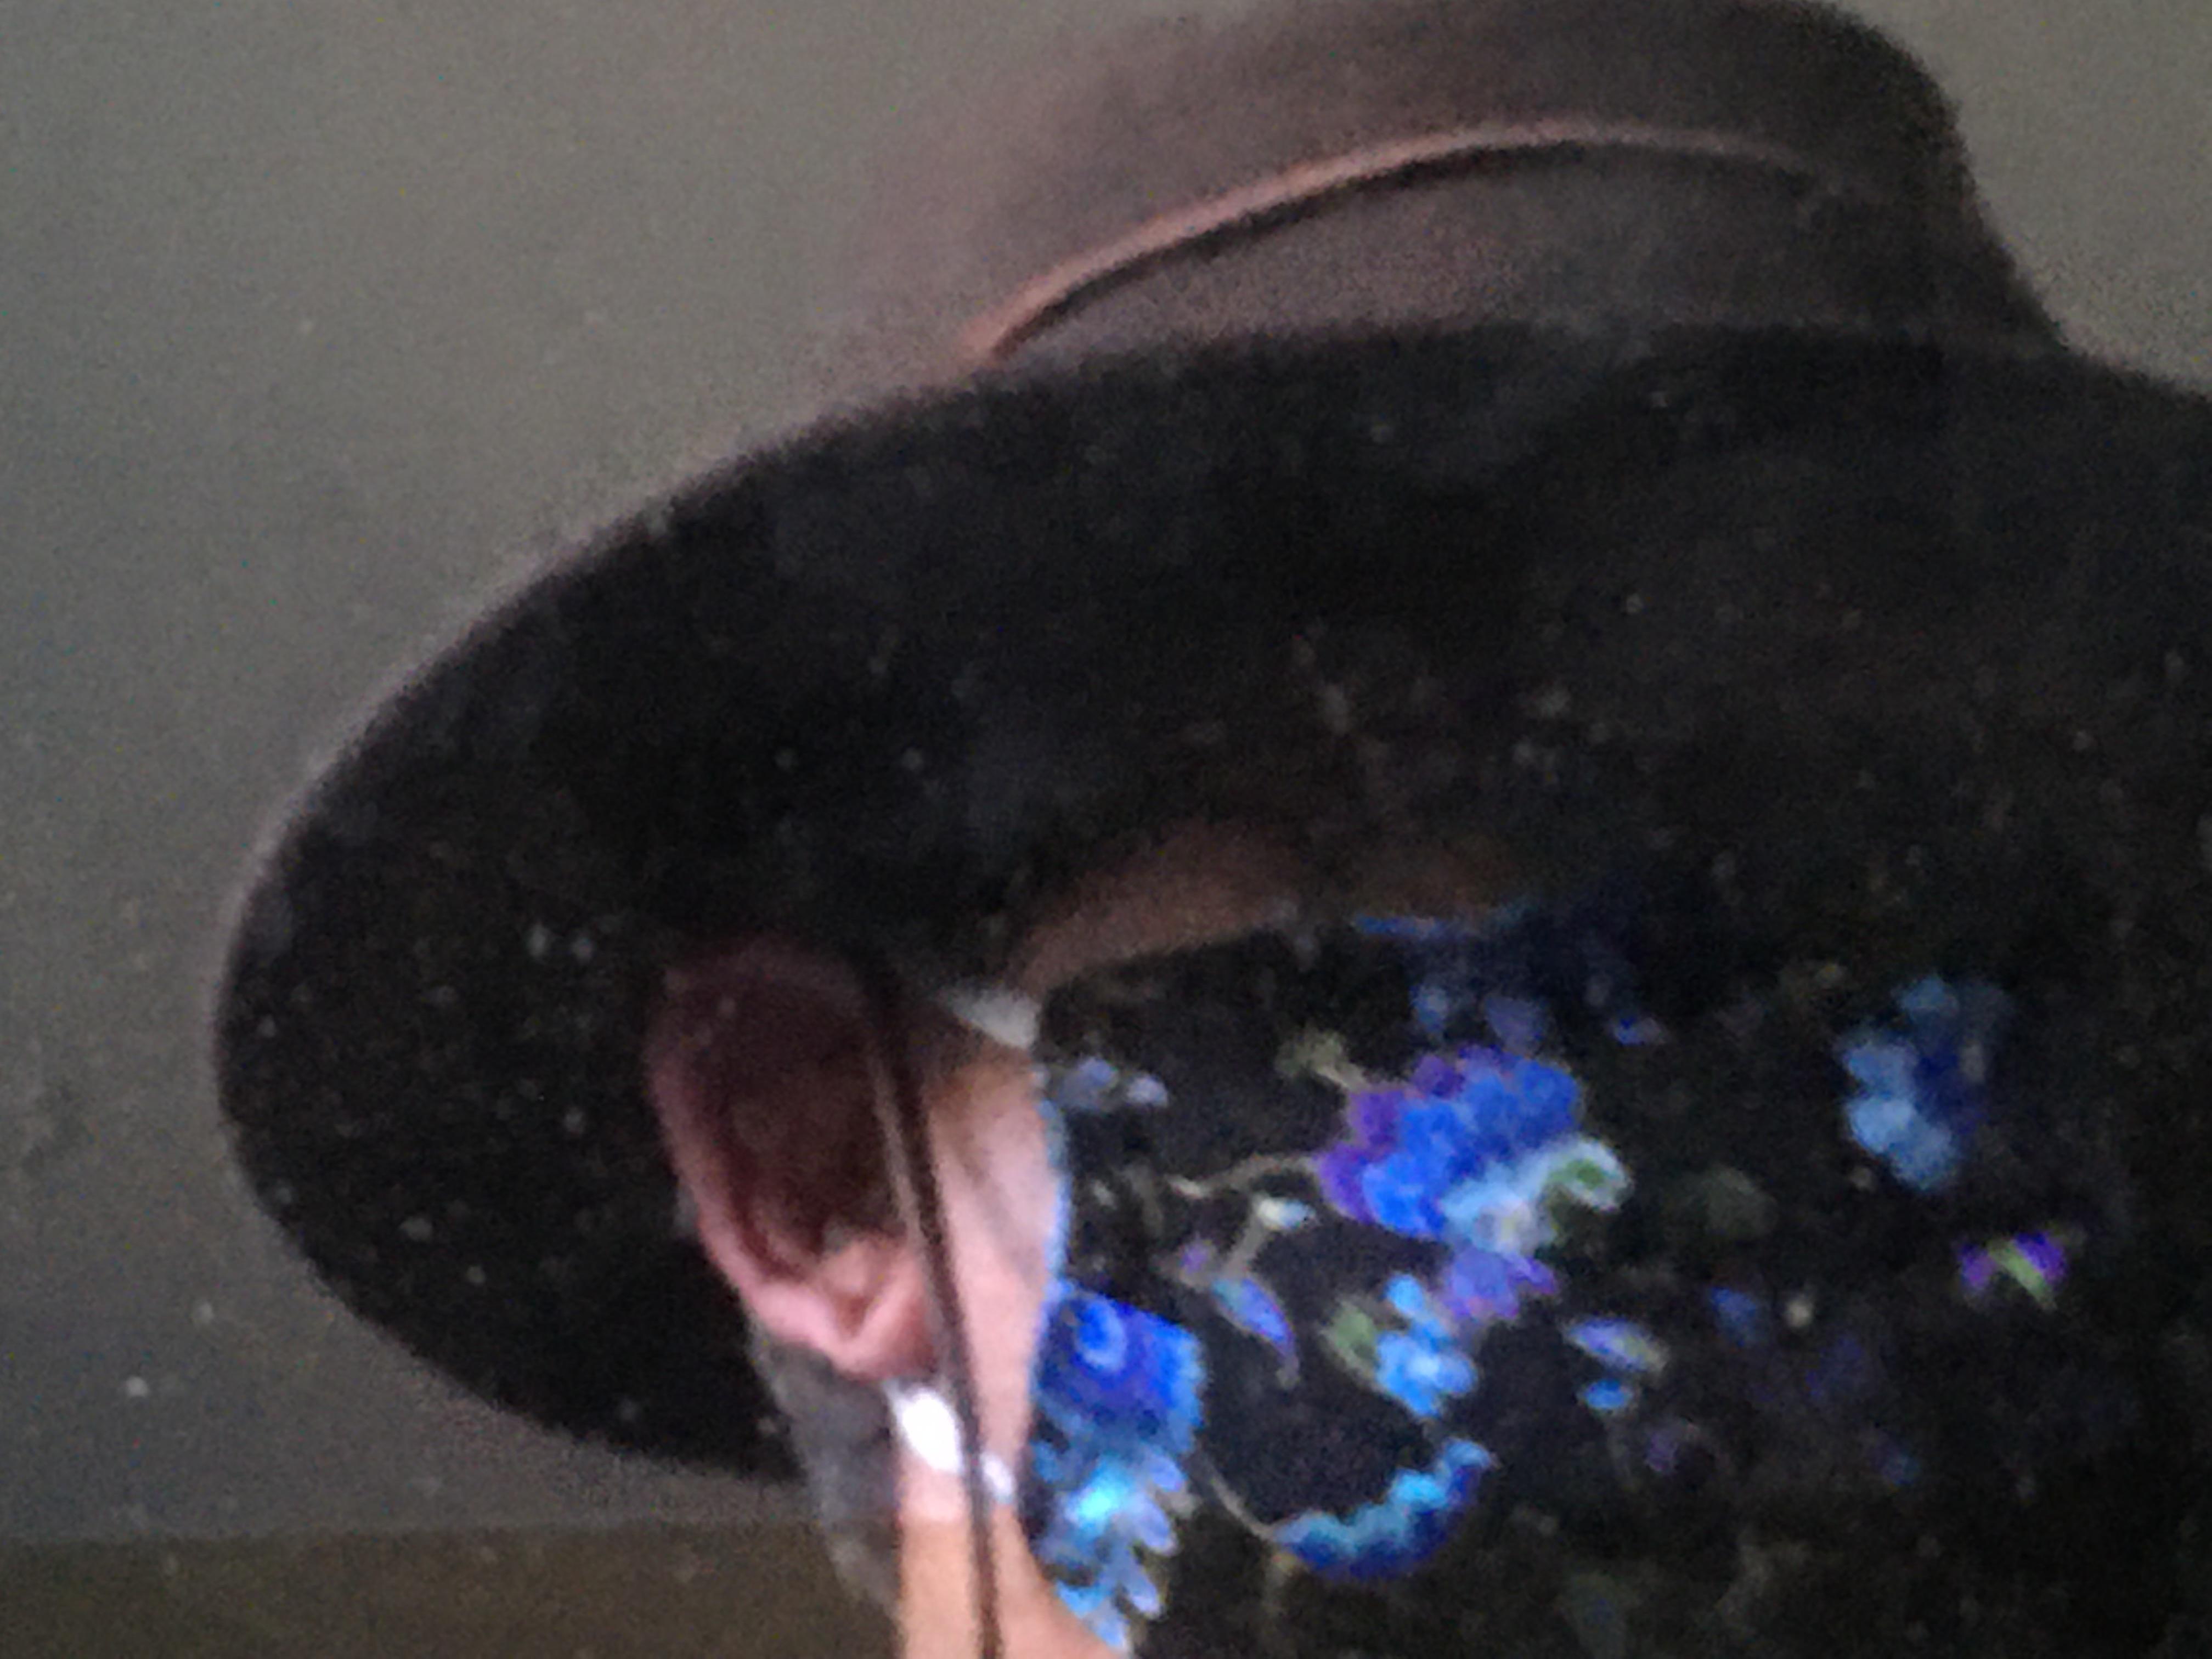 The virus hunter Masked man